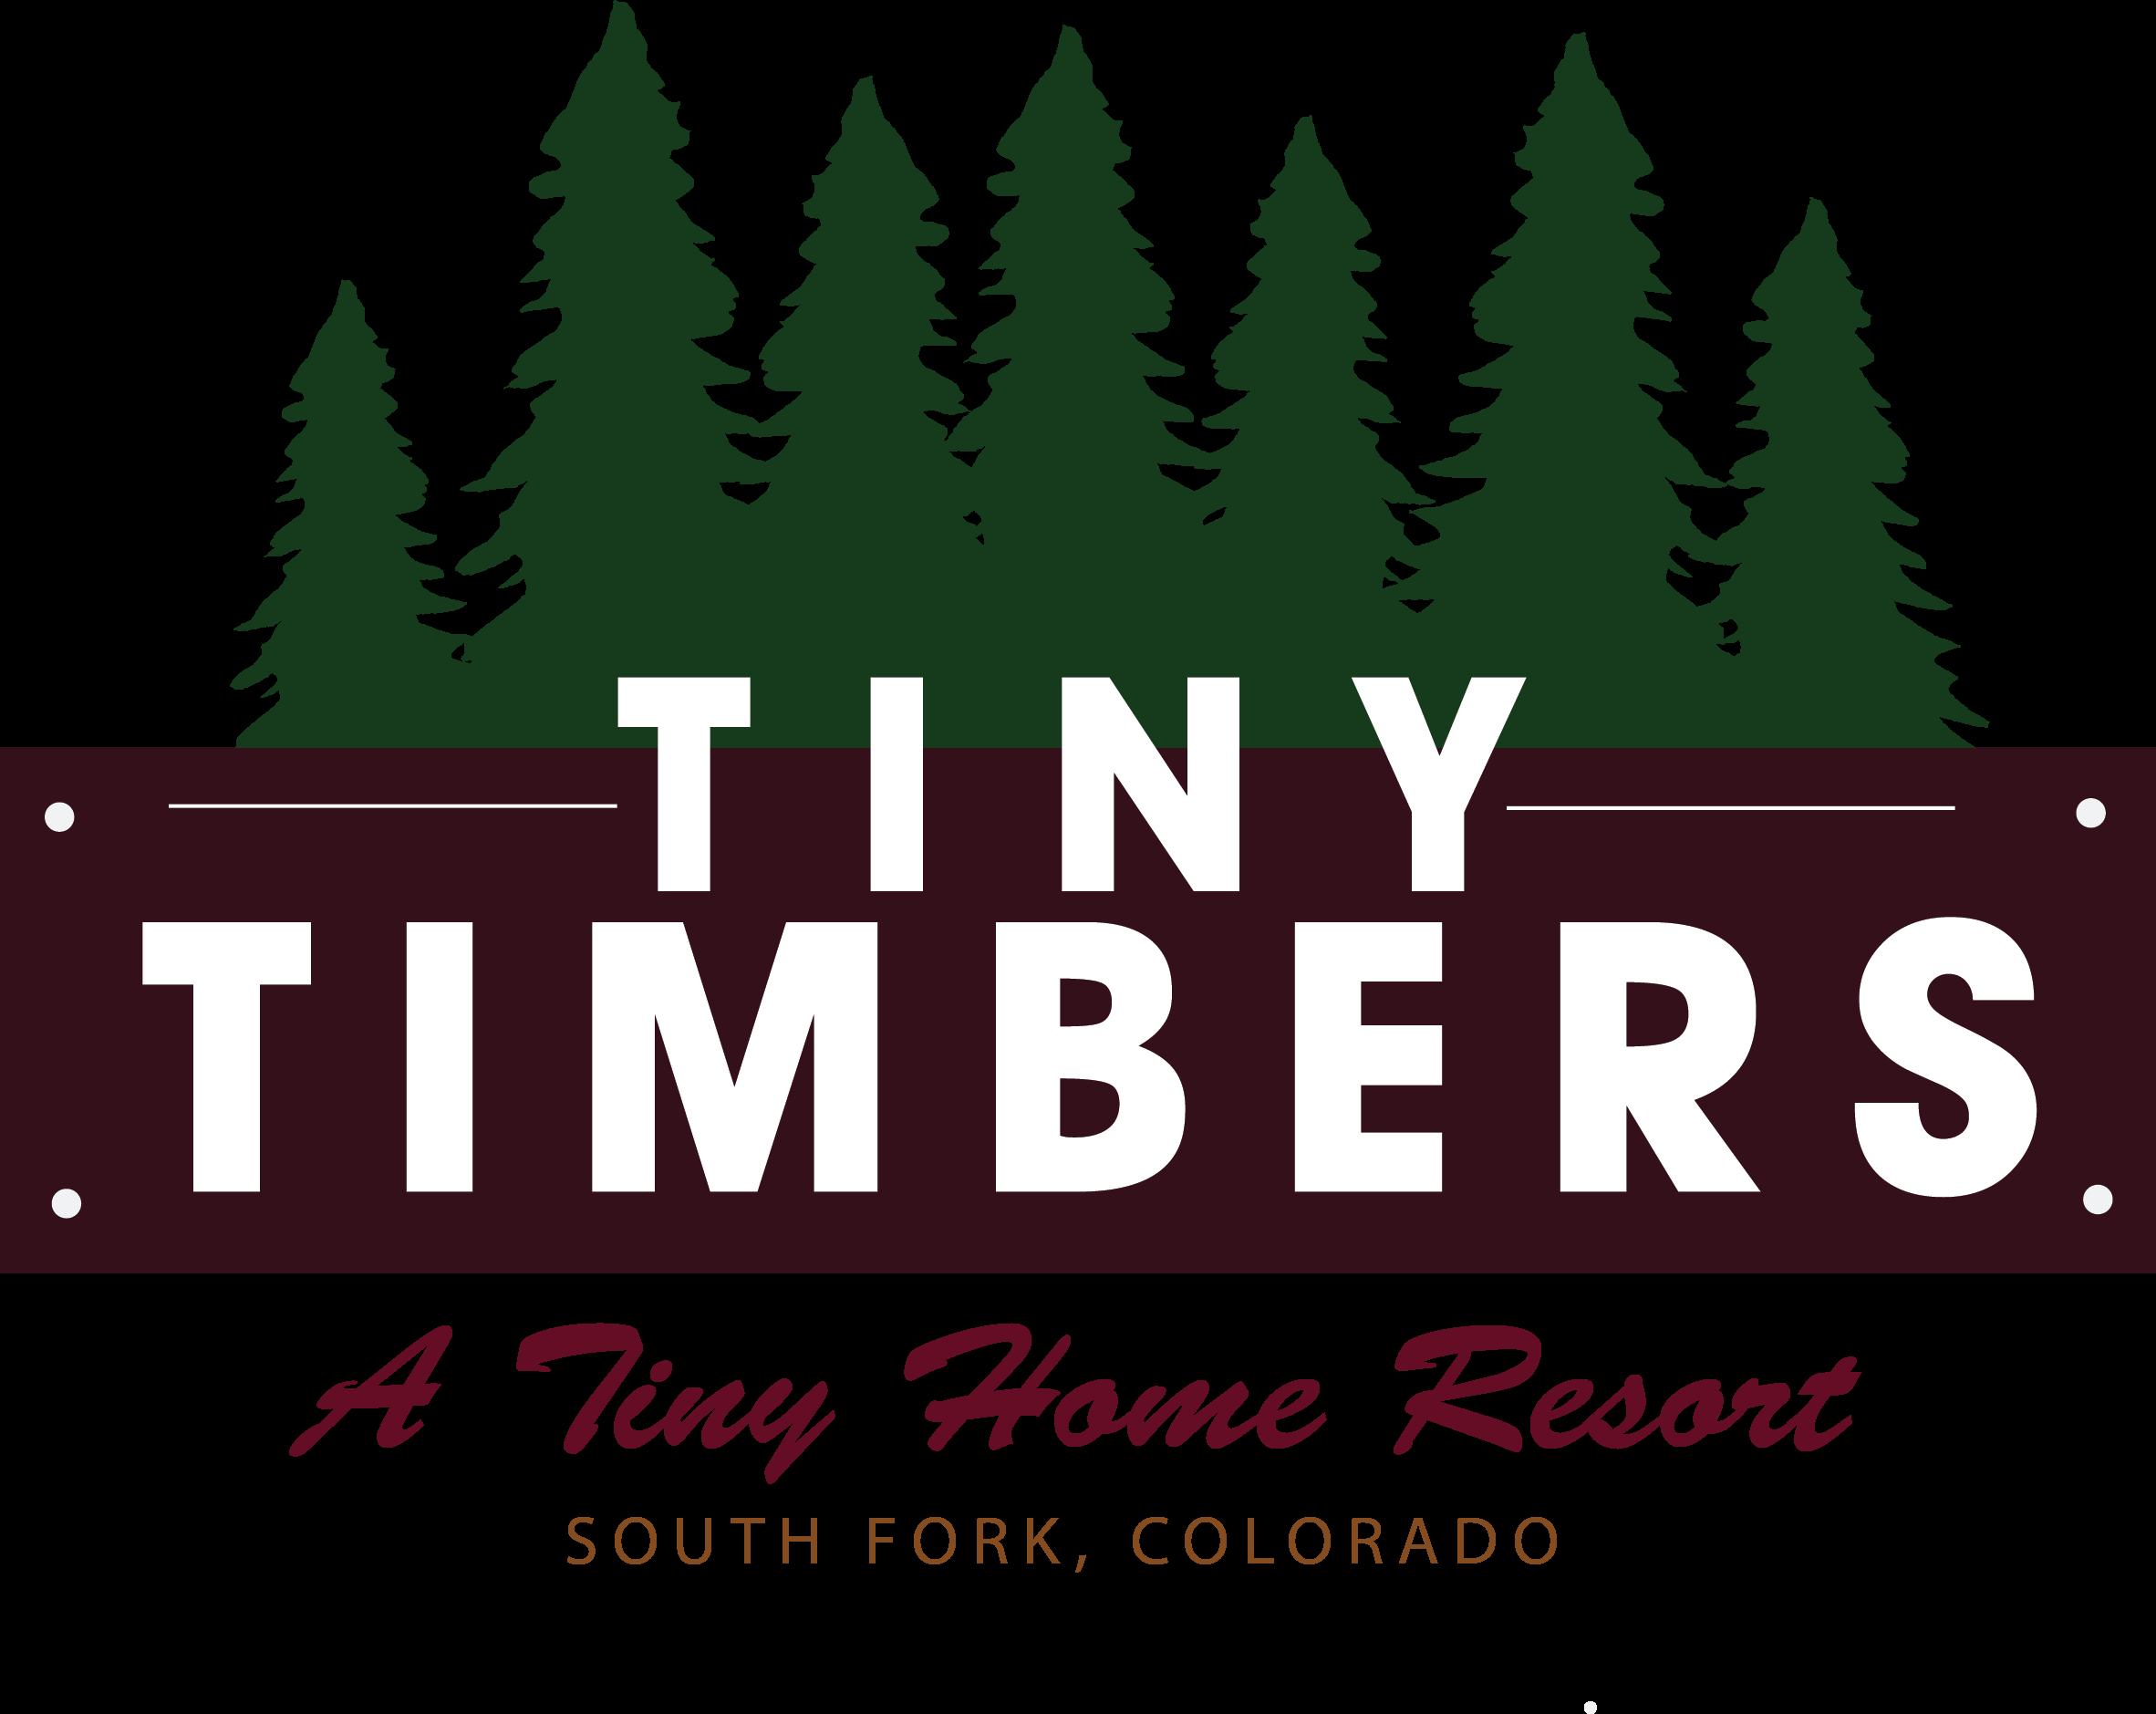 Tiny Timbers Resort